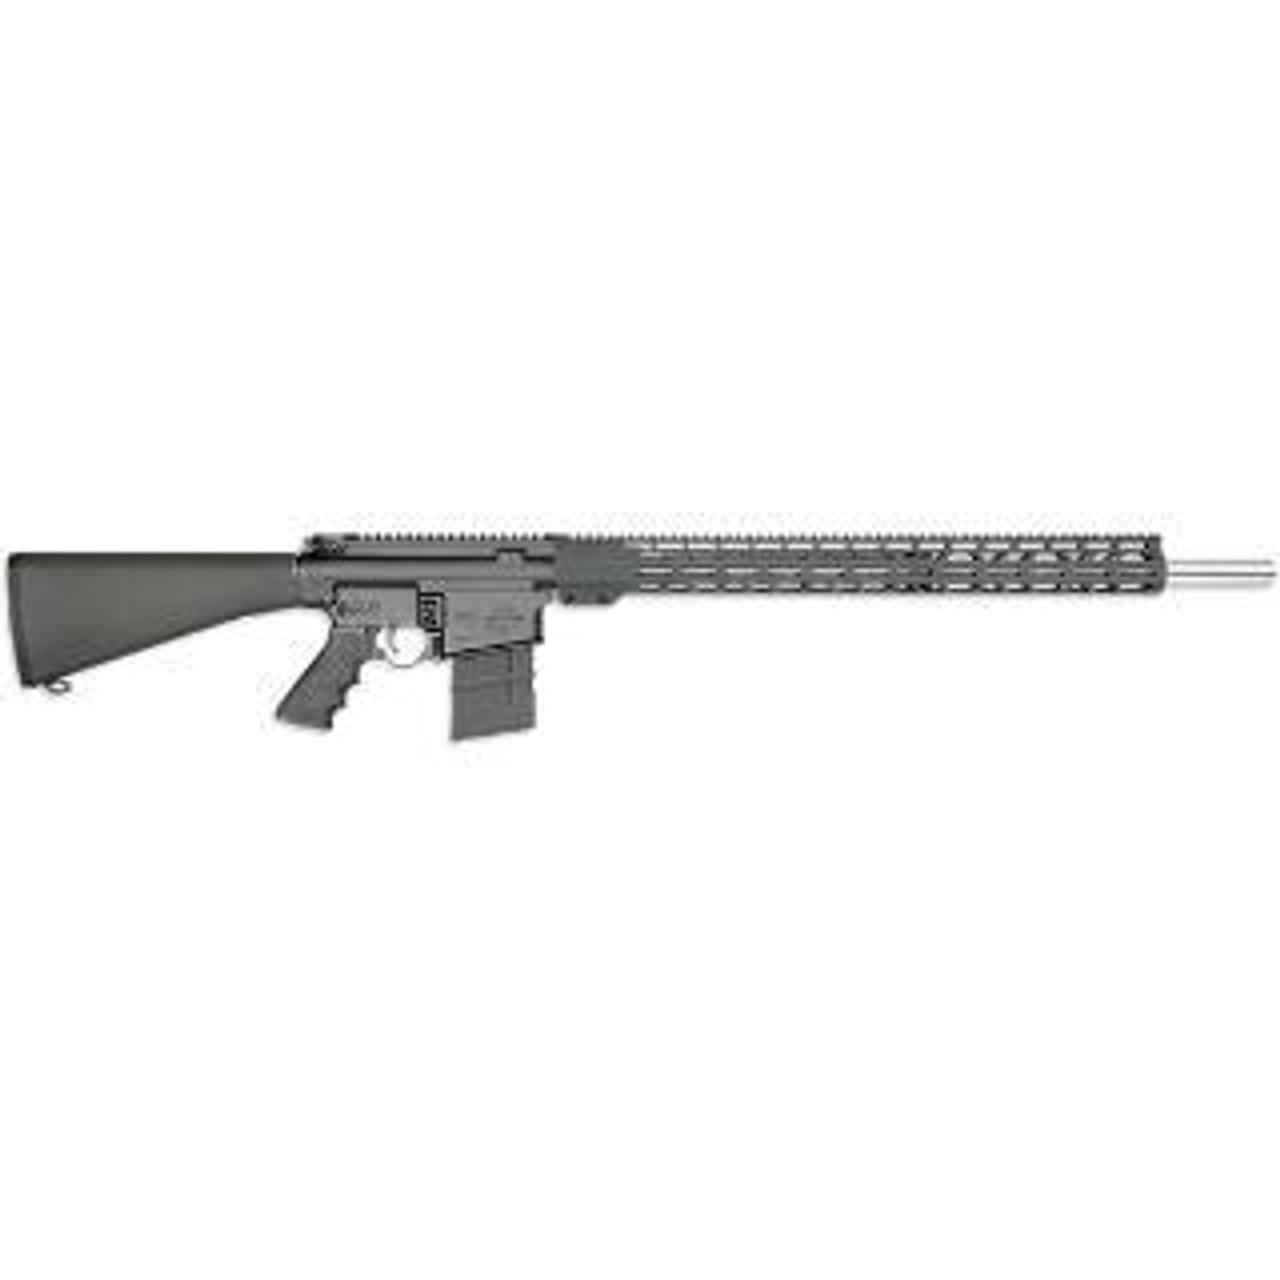 "Rock River Arms LAR-8 Varmint A4 26"" CALIFORNIA LEGAL - .308/7.62x51"